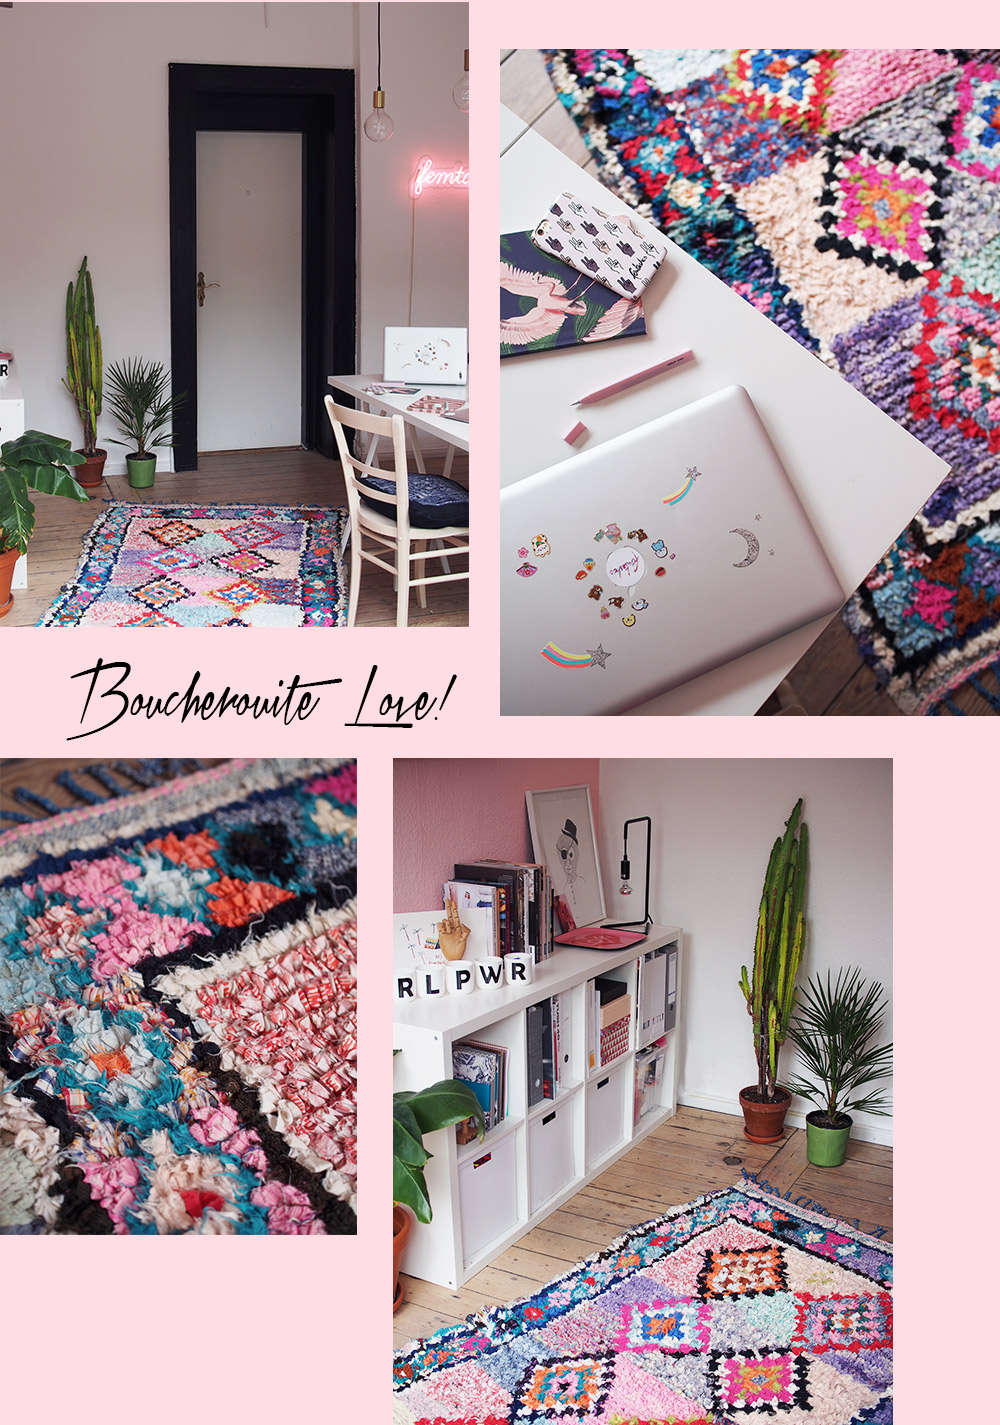 femtastics-On-the-rugs-Boucheroite-Teppich-Office